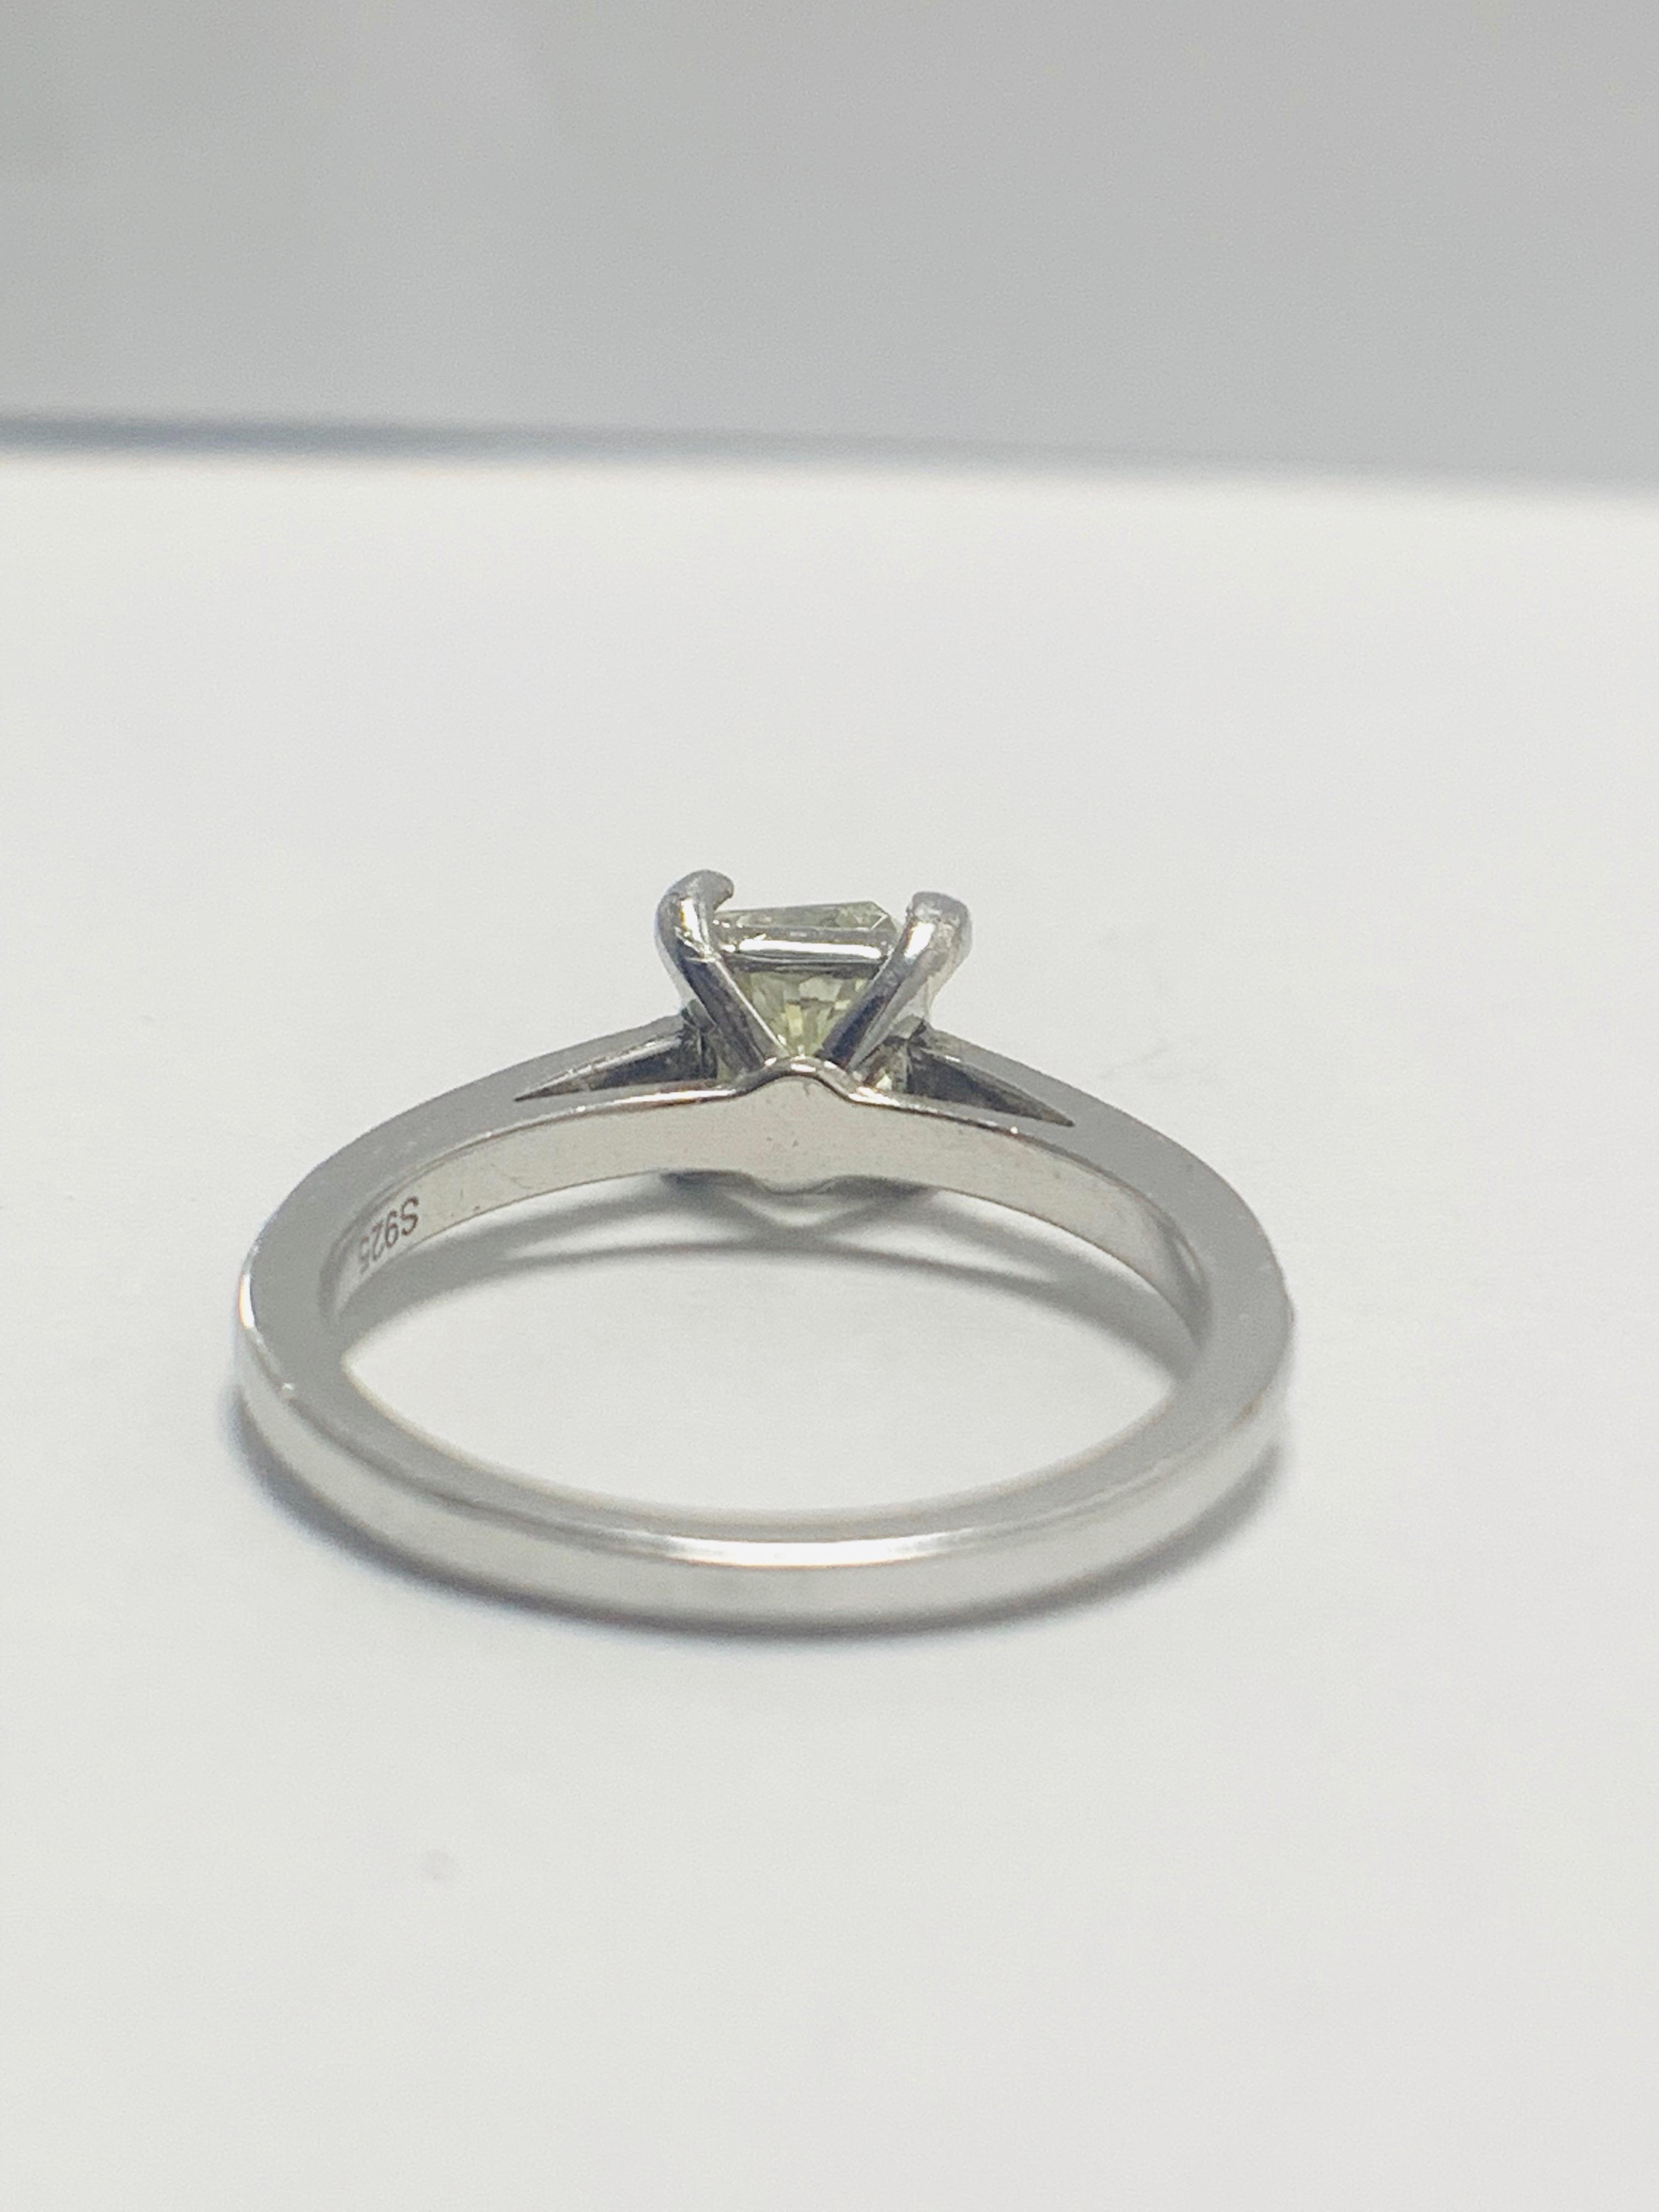 1ct cushion cut platinum diamond solitaire ring - Image 5 of 8